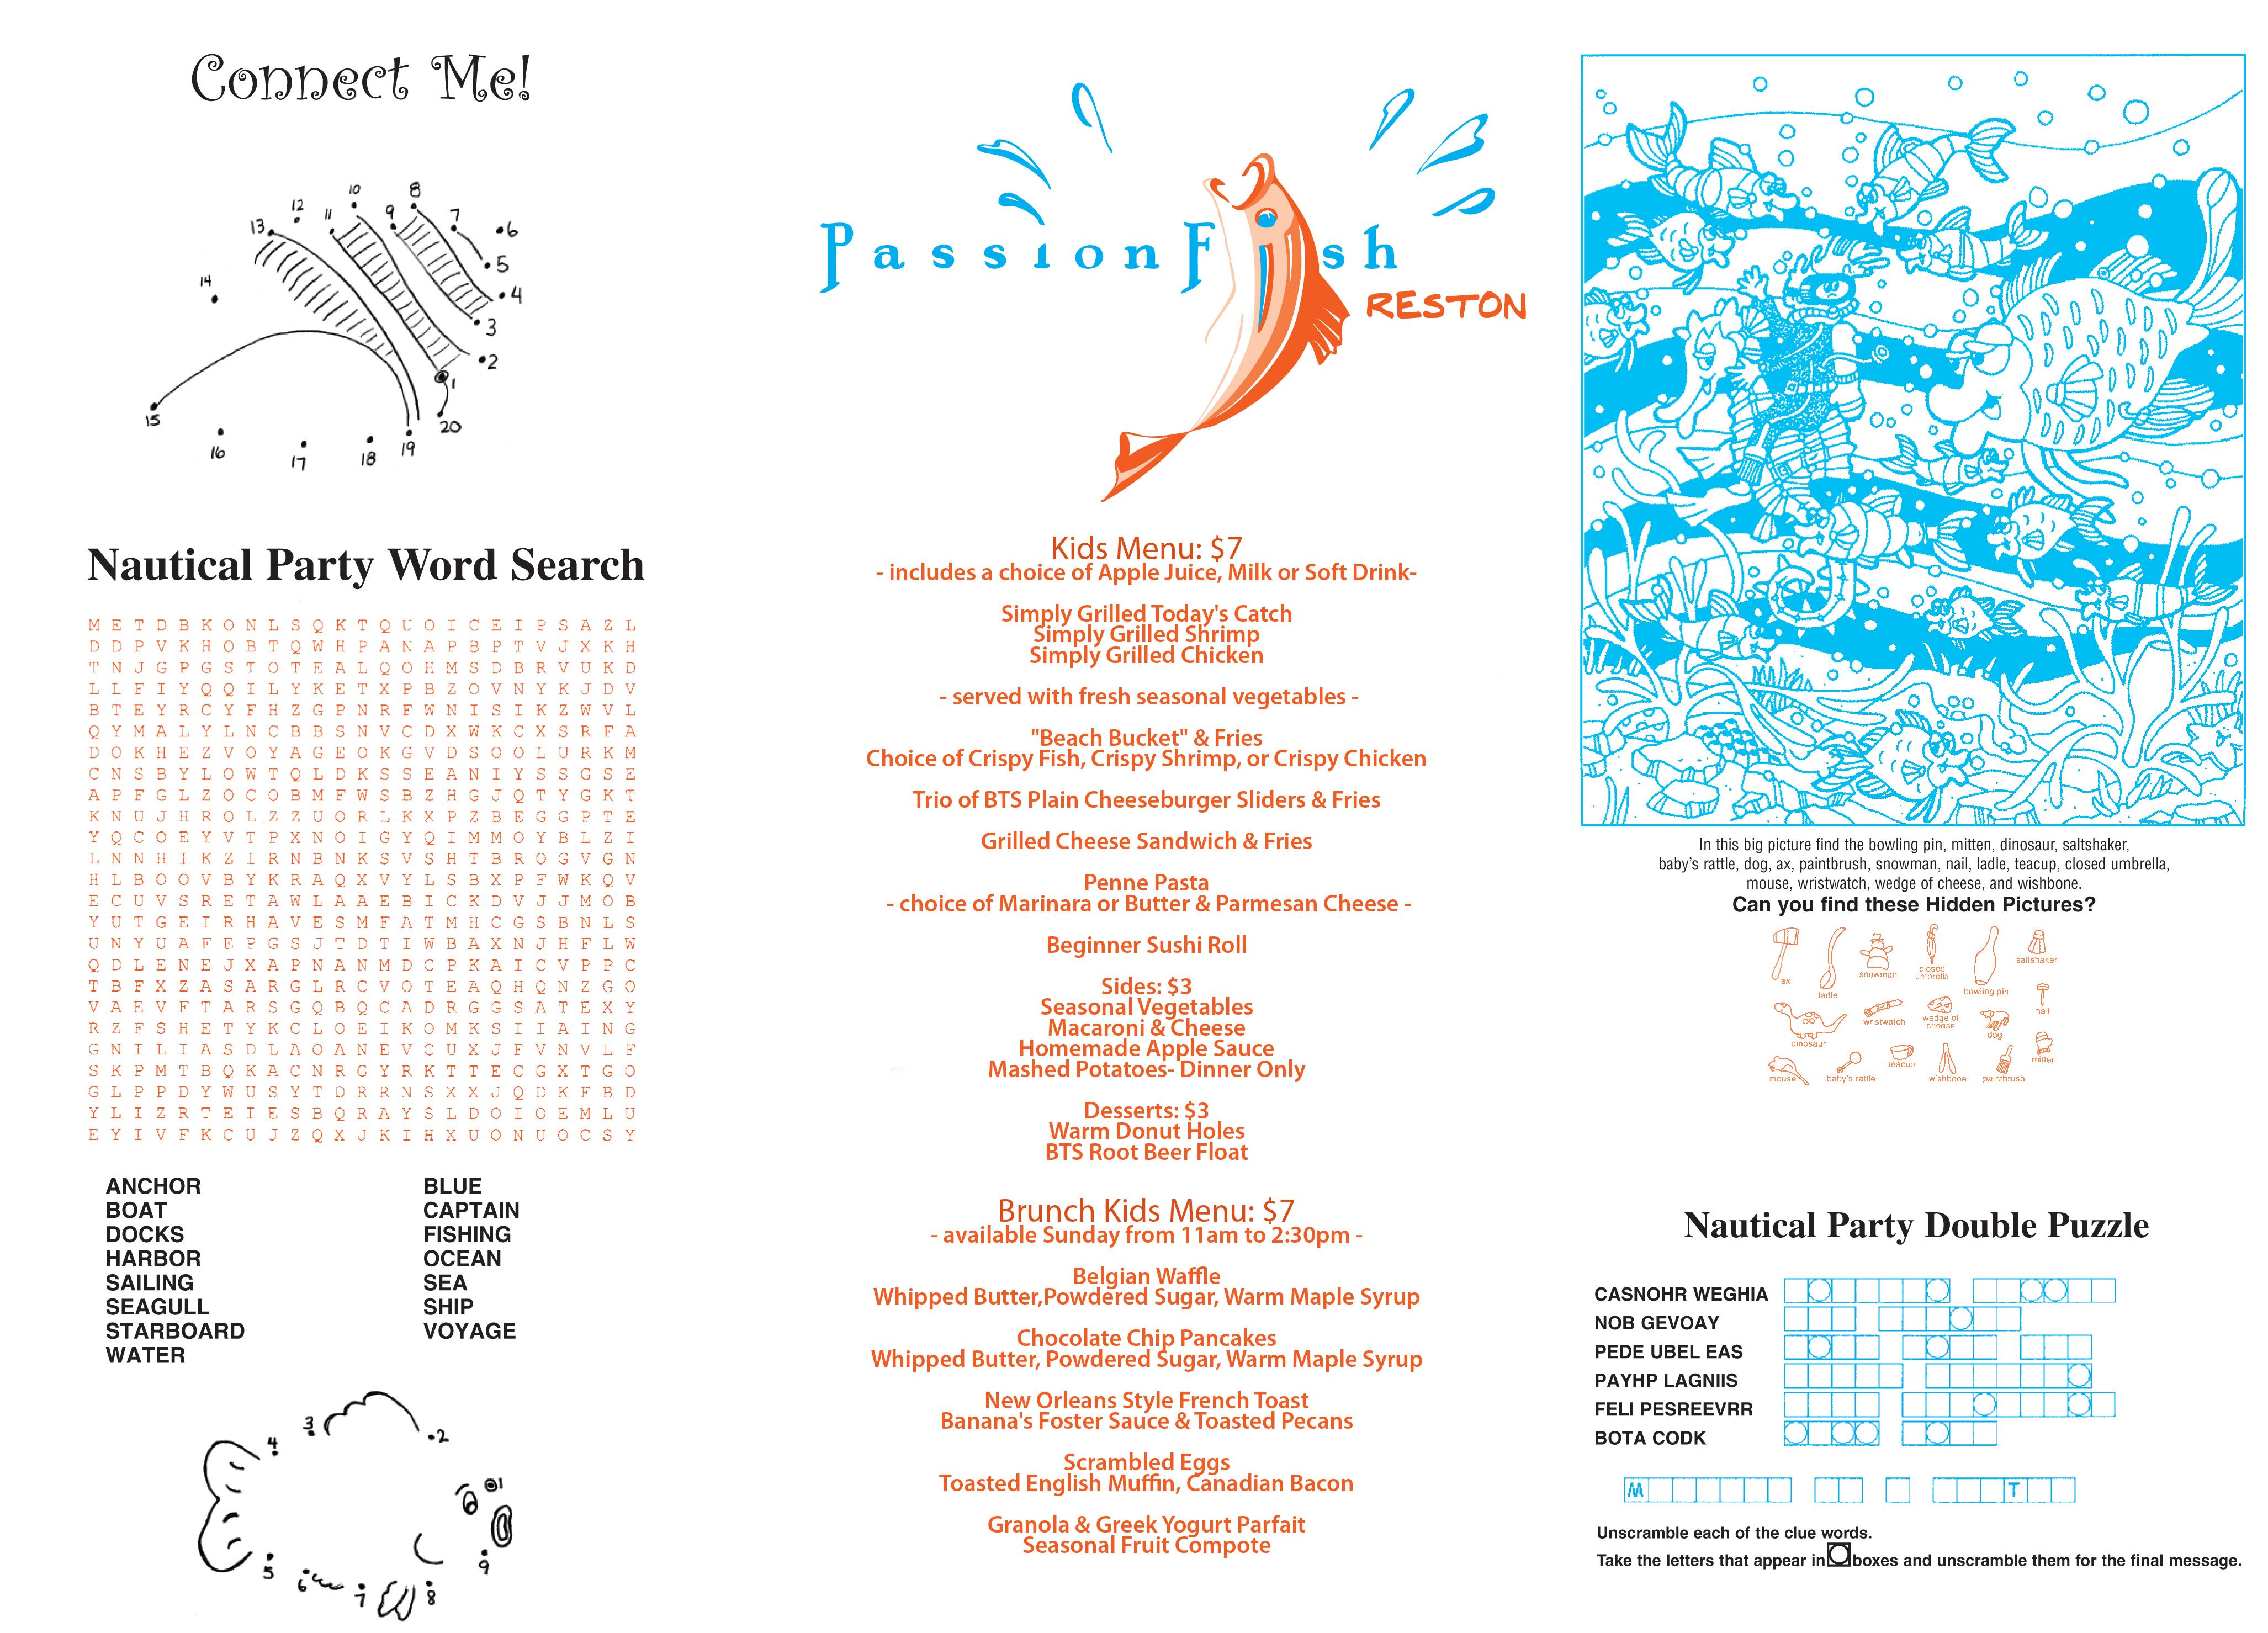 Passionfish reston for Passion fish reston menu